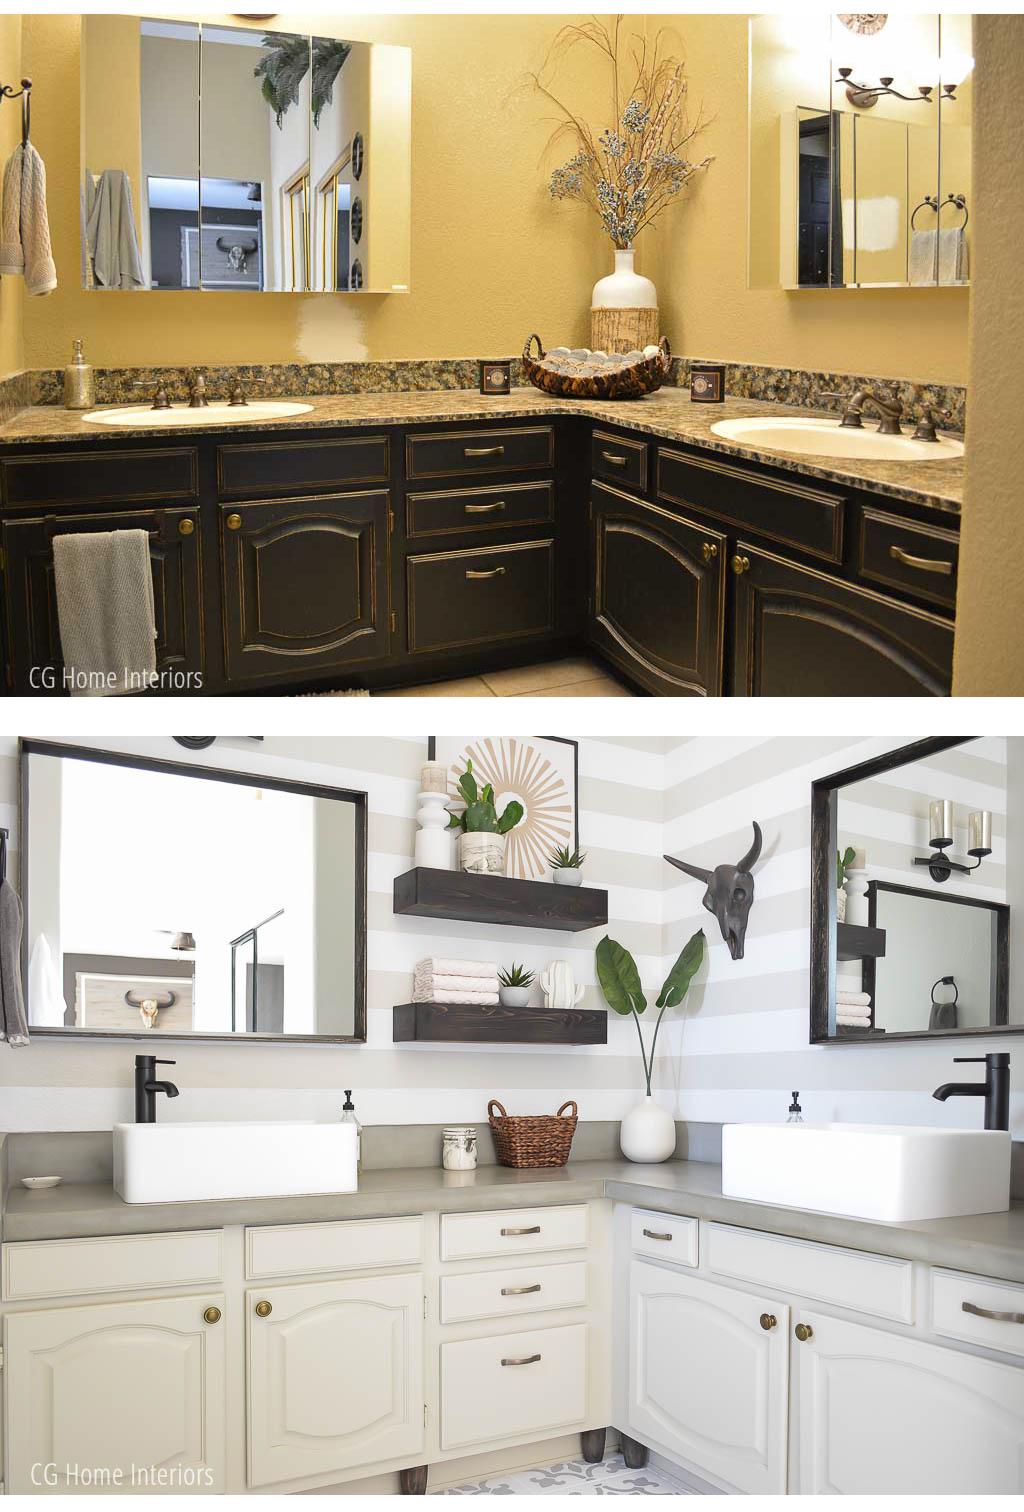 Builder Grade Bathroom Vanity Makeover Before and After